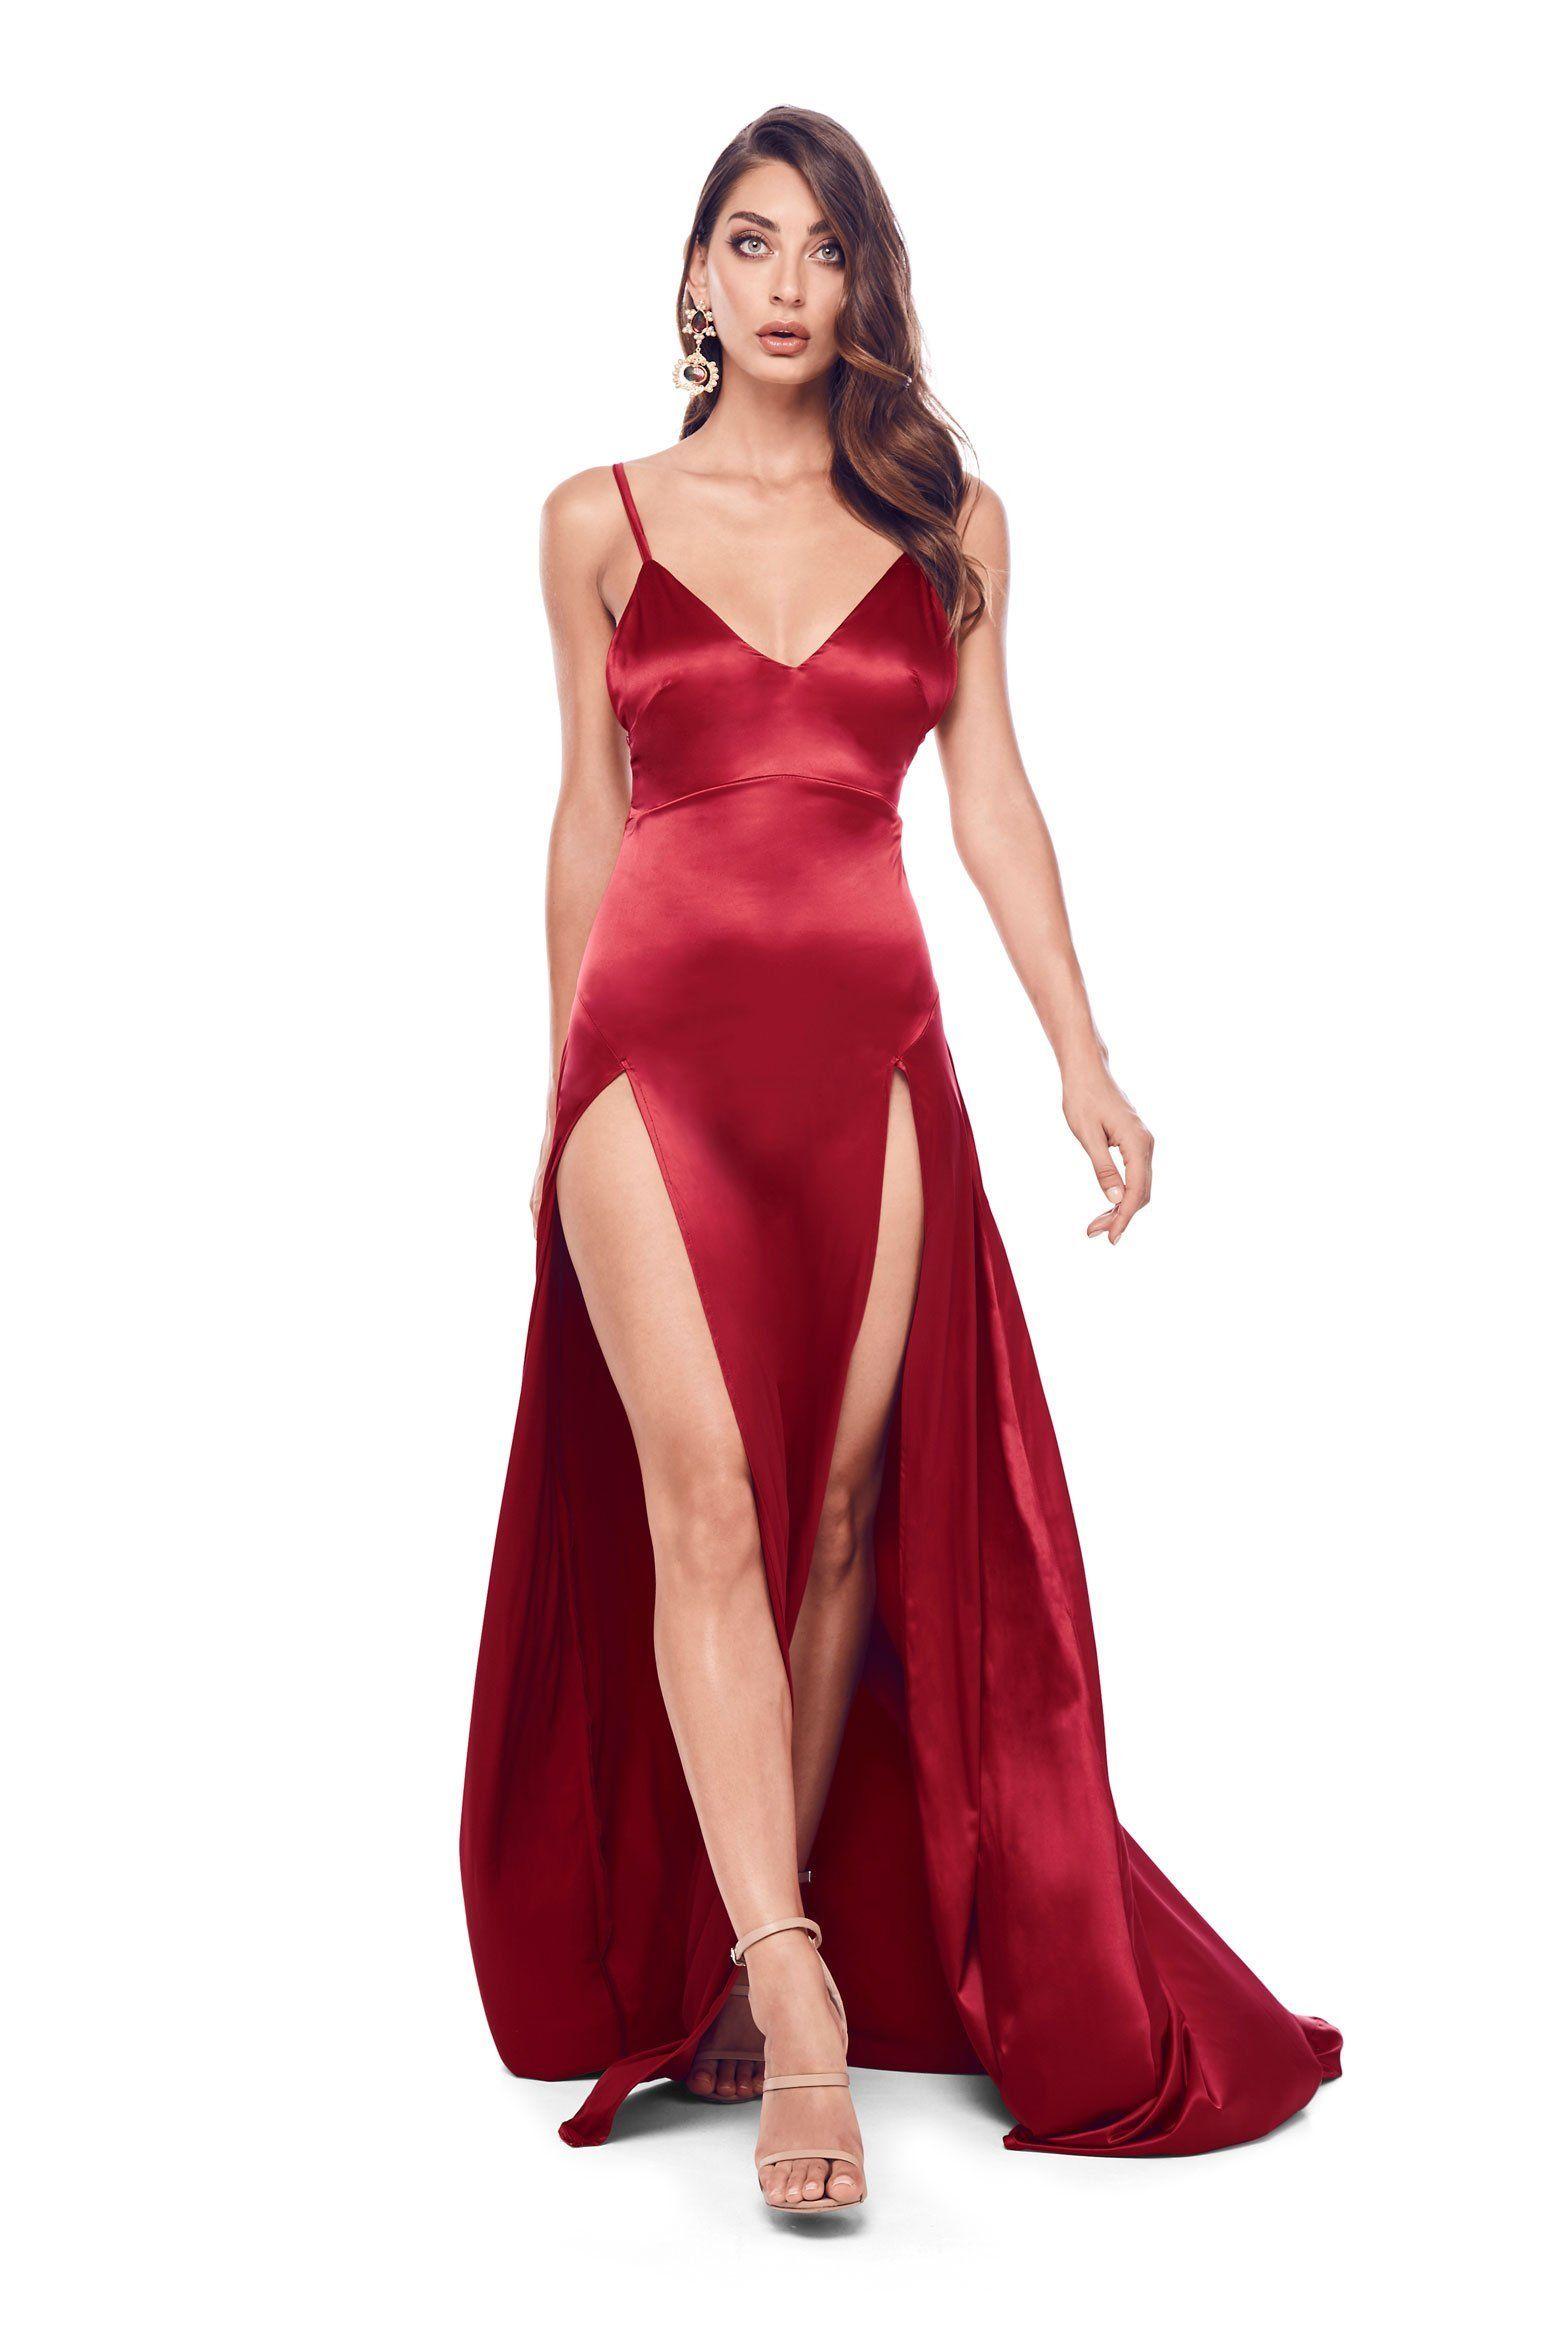 Alexis cherry red in promhoco pinterest cherry red